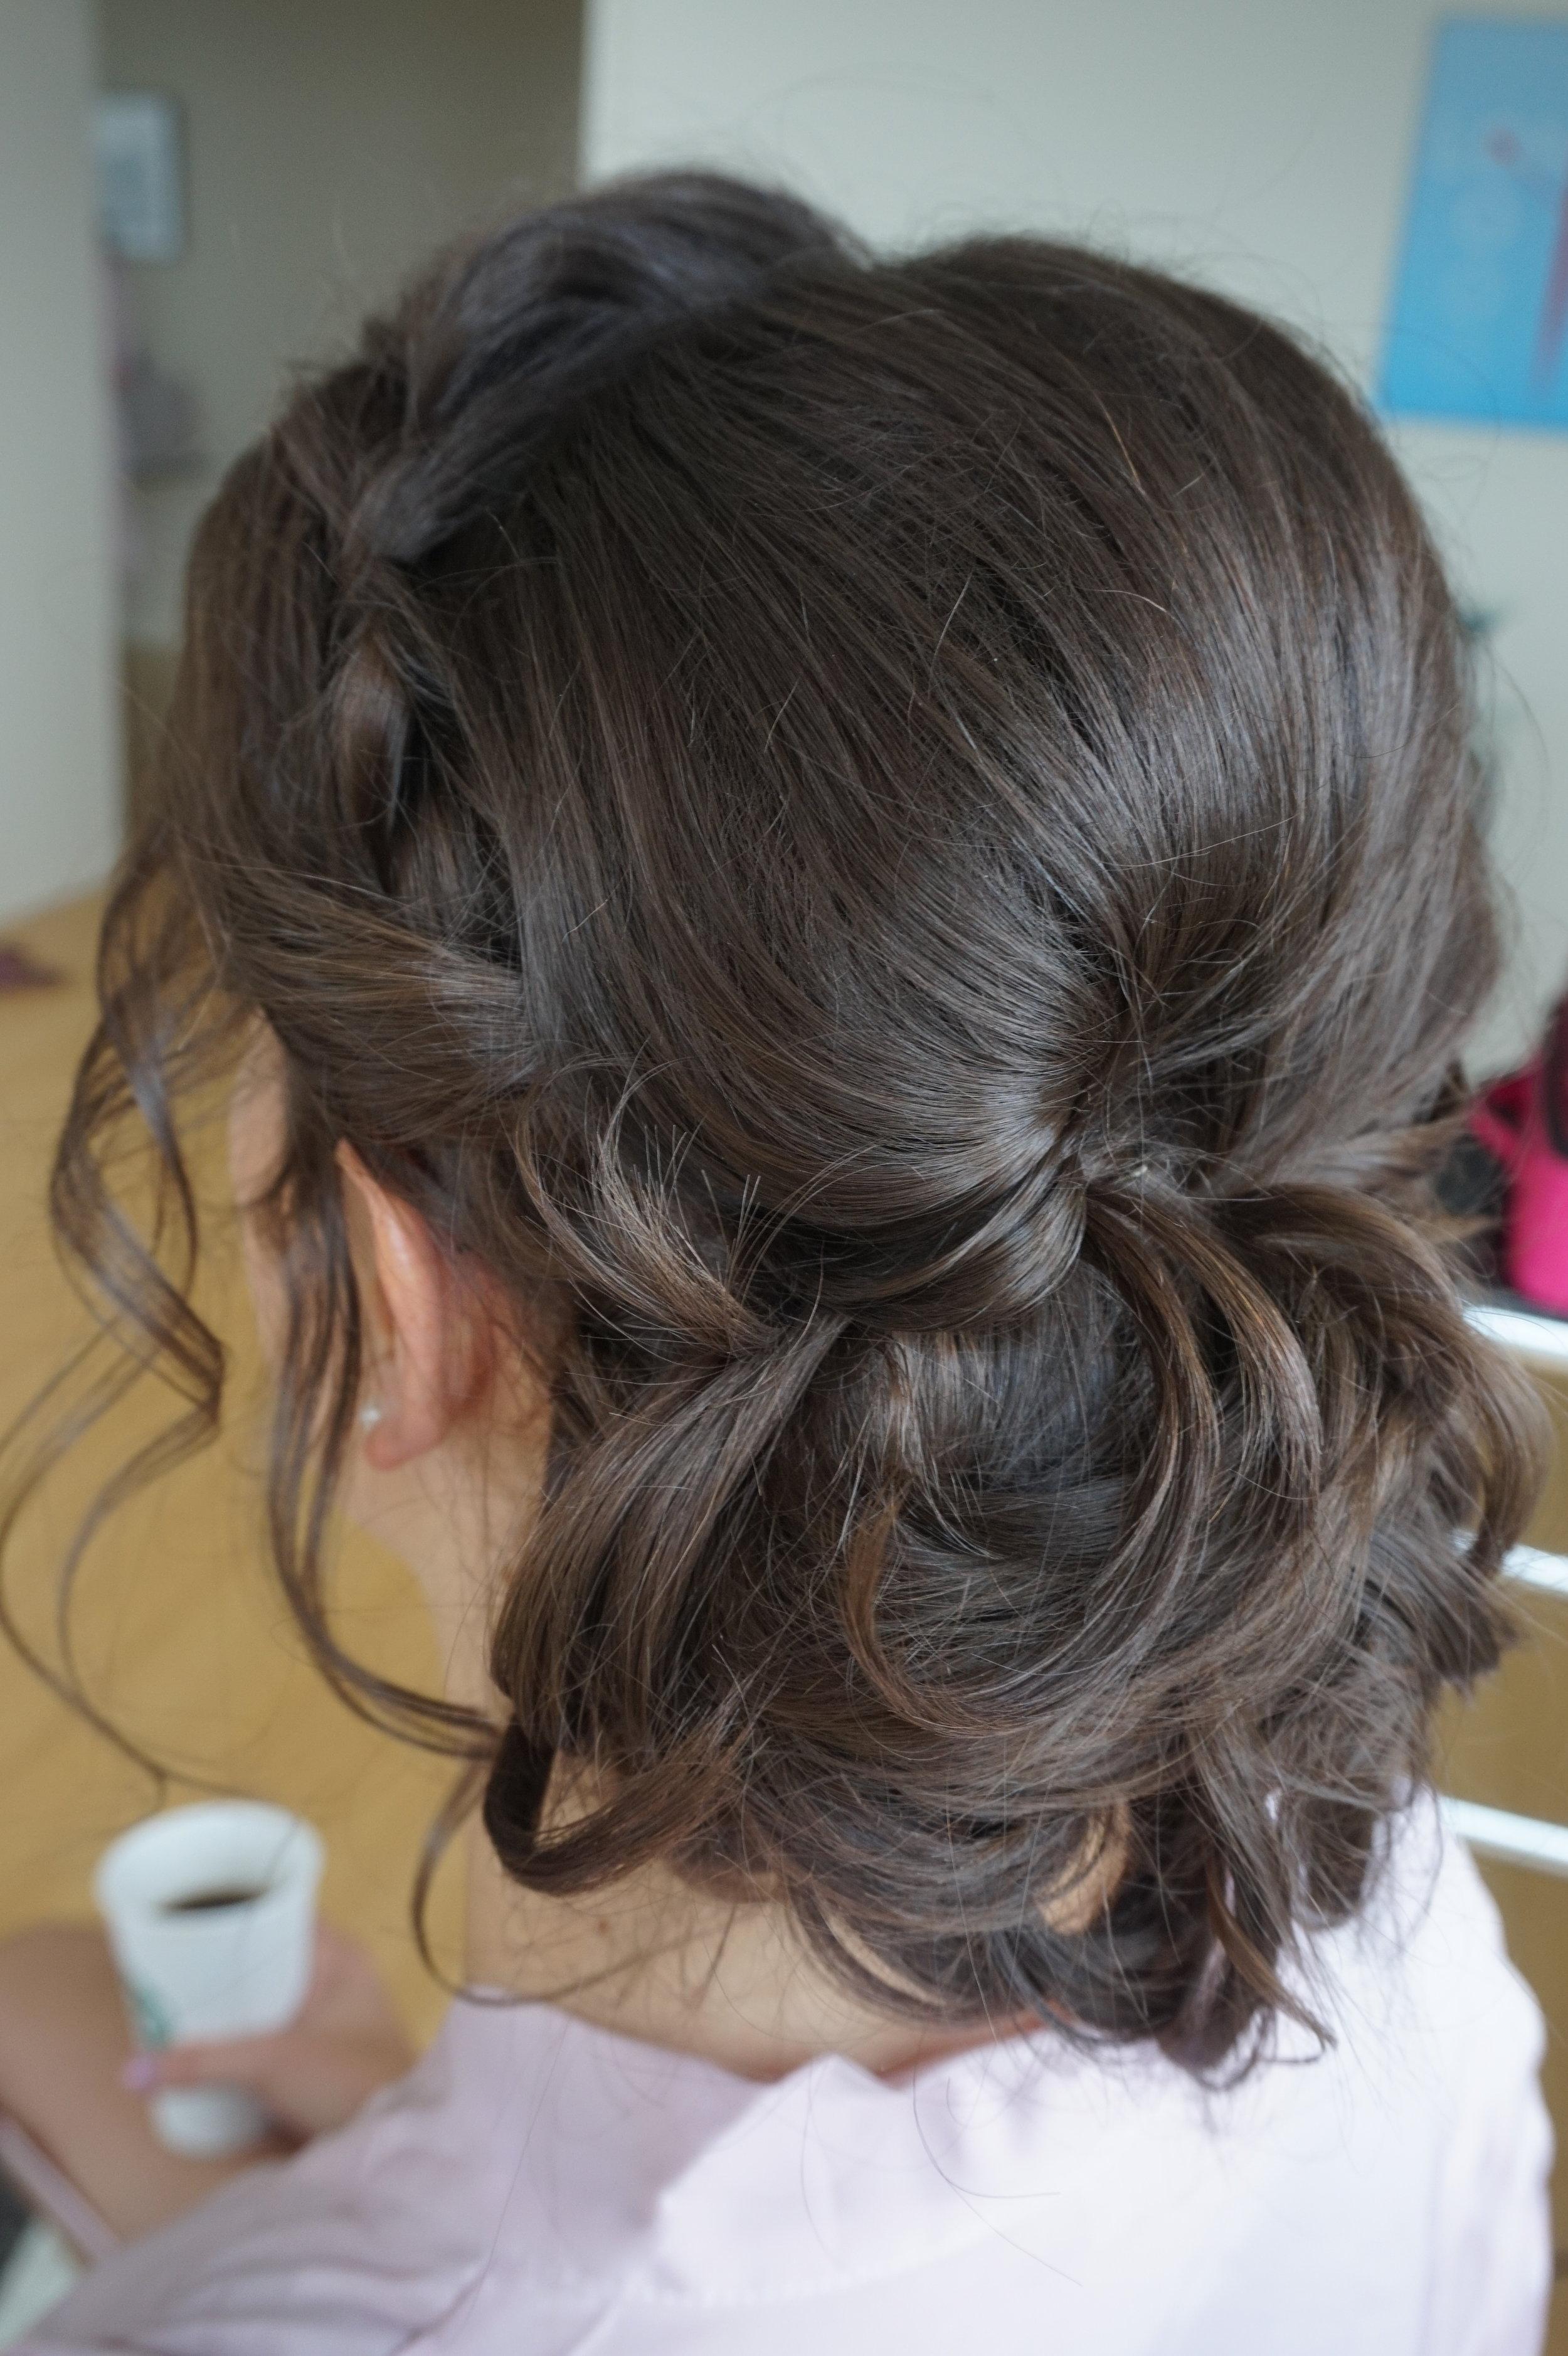 Beauty by Sacha - Hair